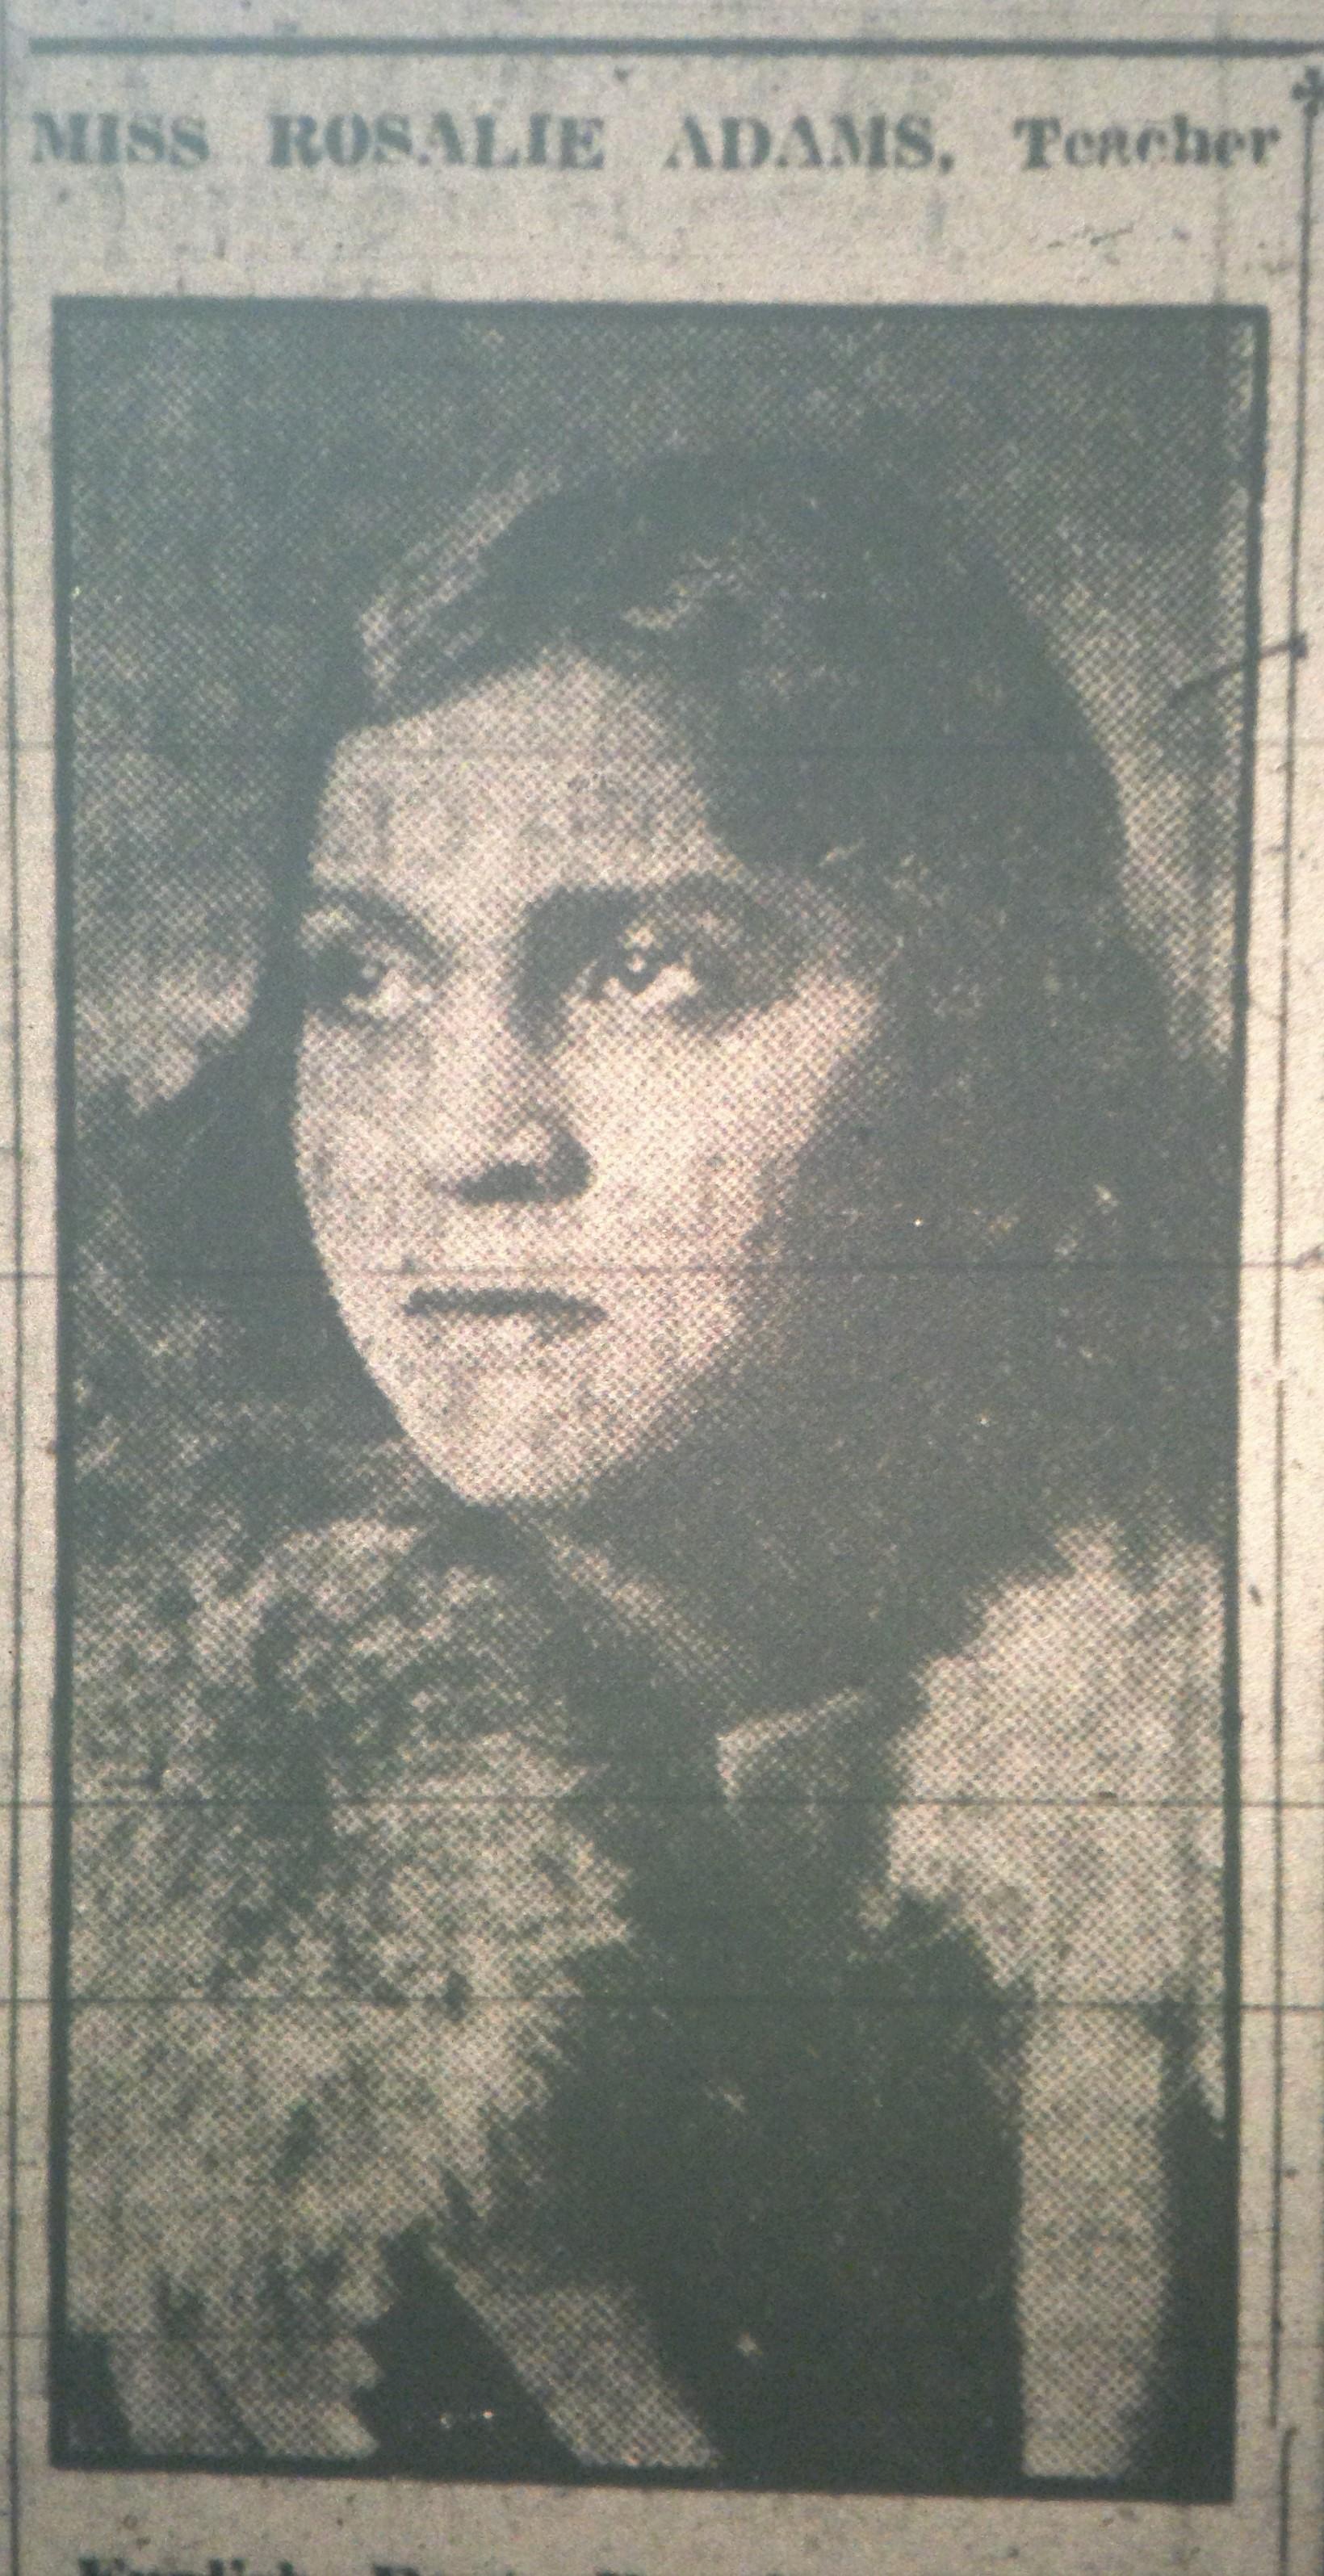 Notable Blacks of Logan County LB 04.16.1929 11